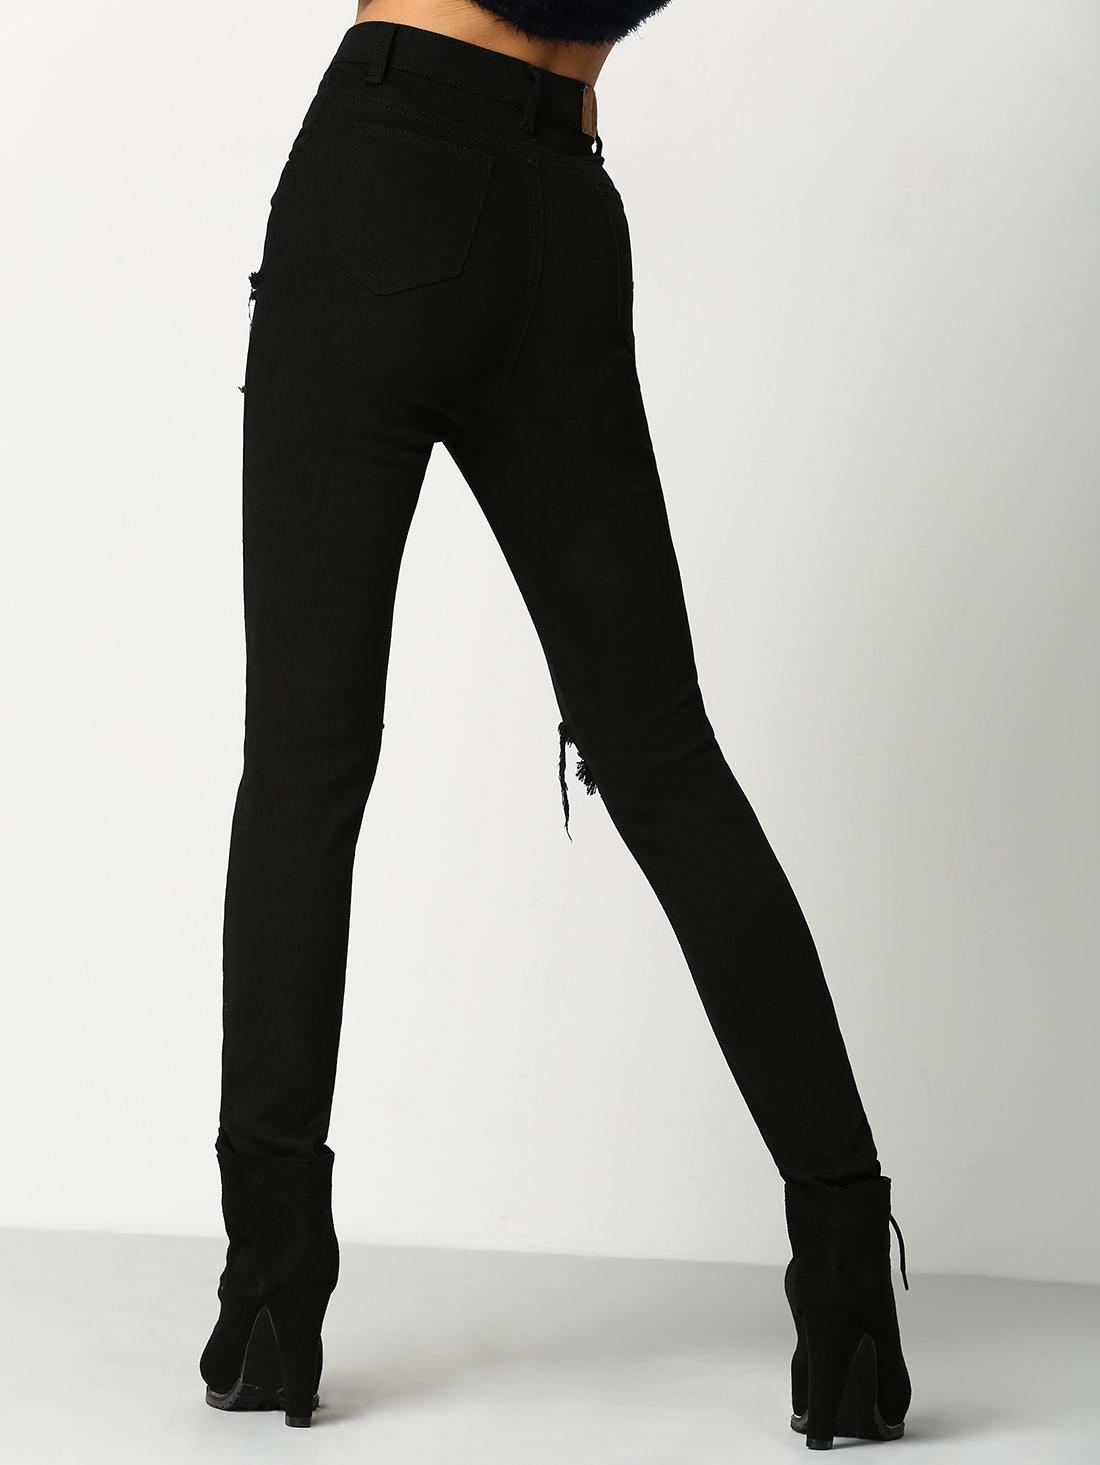 Pantalón Negro Roto - Seven Store